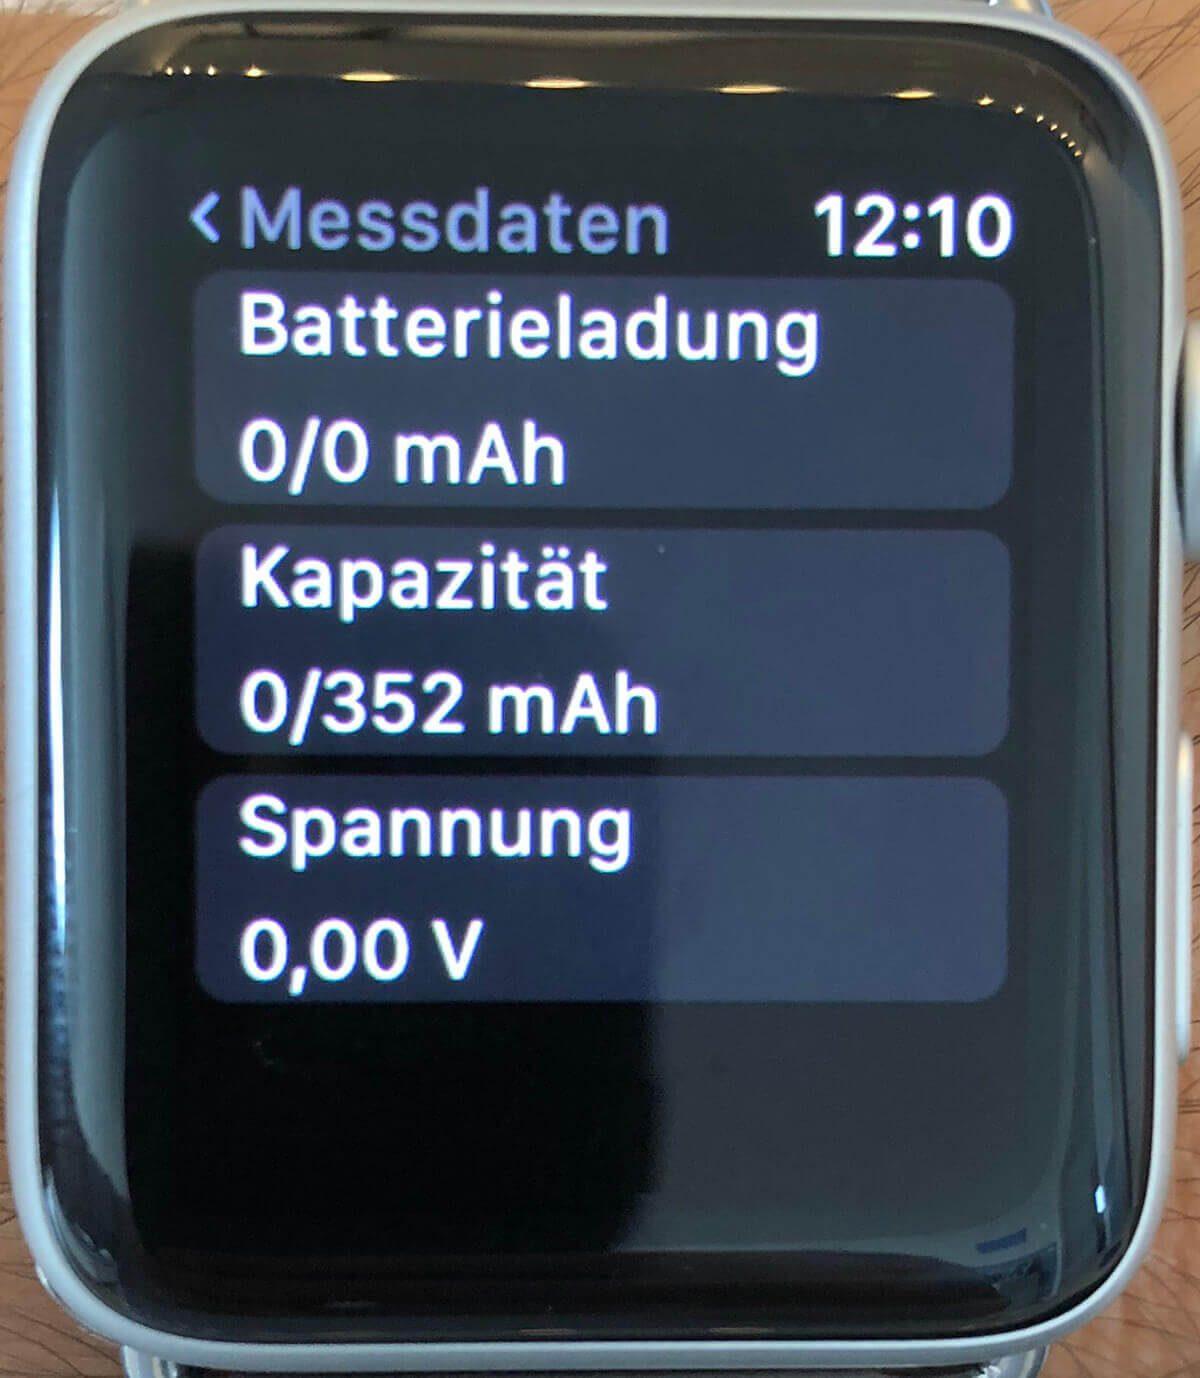 "Die App ""Battery Life"" zeigt bei der Kapazität der Series 3 LTE sogar 352 mAh Kapazität an (Foto: M. König)."